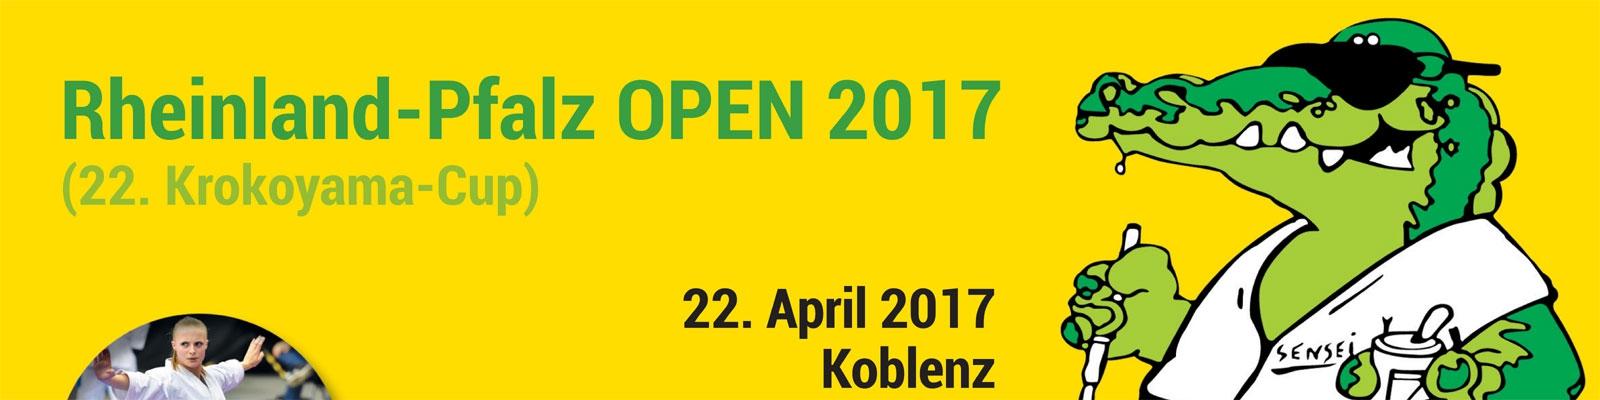 set online dkv rheinland pfalz open 2017 22 krokoyama cup. Black Bedroom Furniture Sets. Home Design Ideas